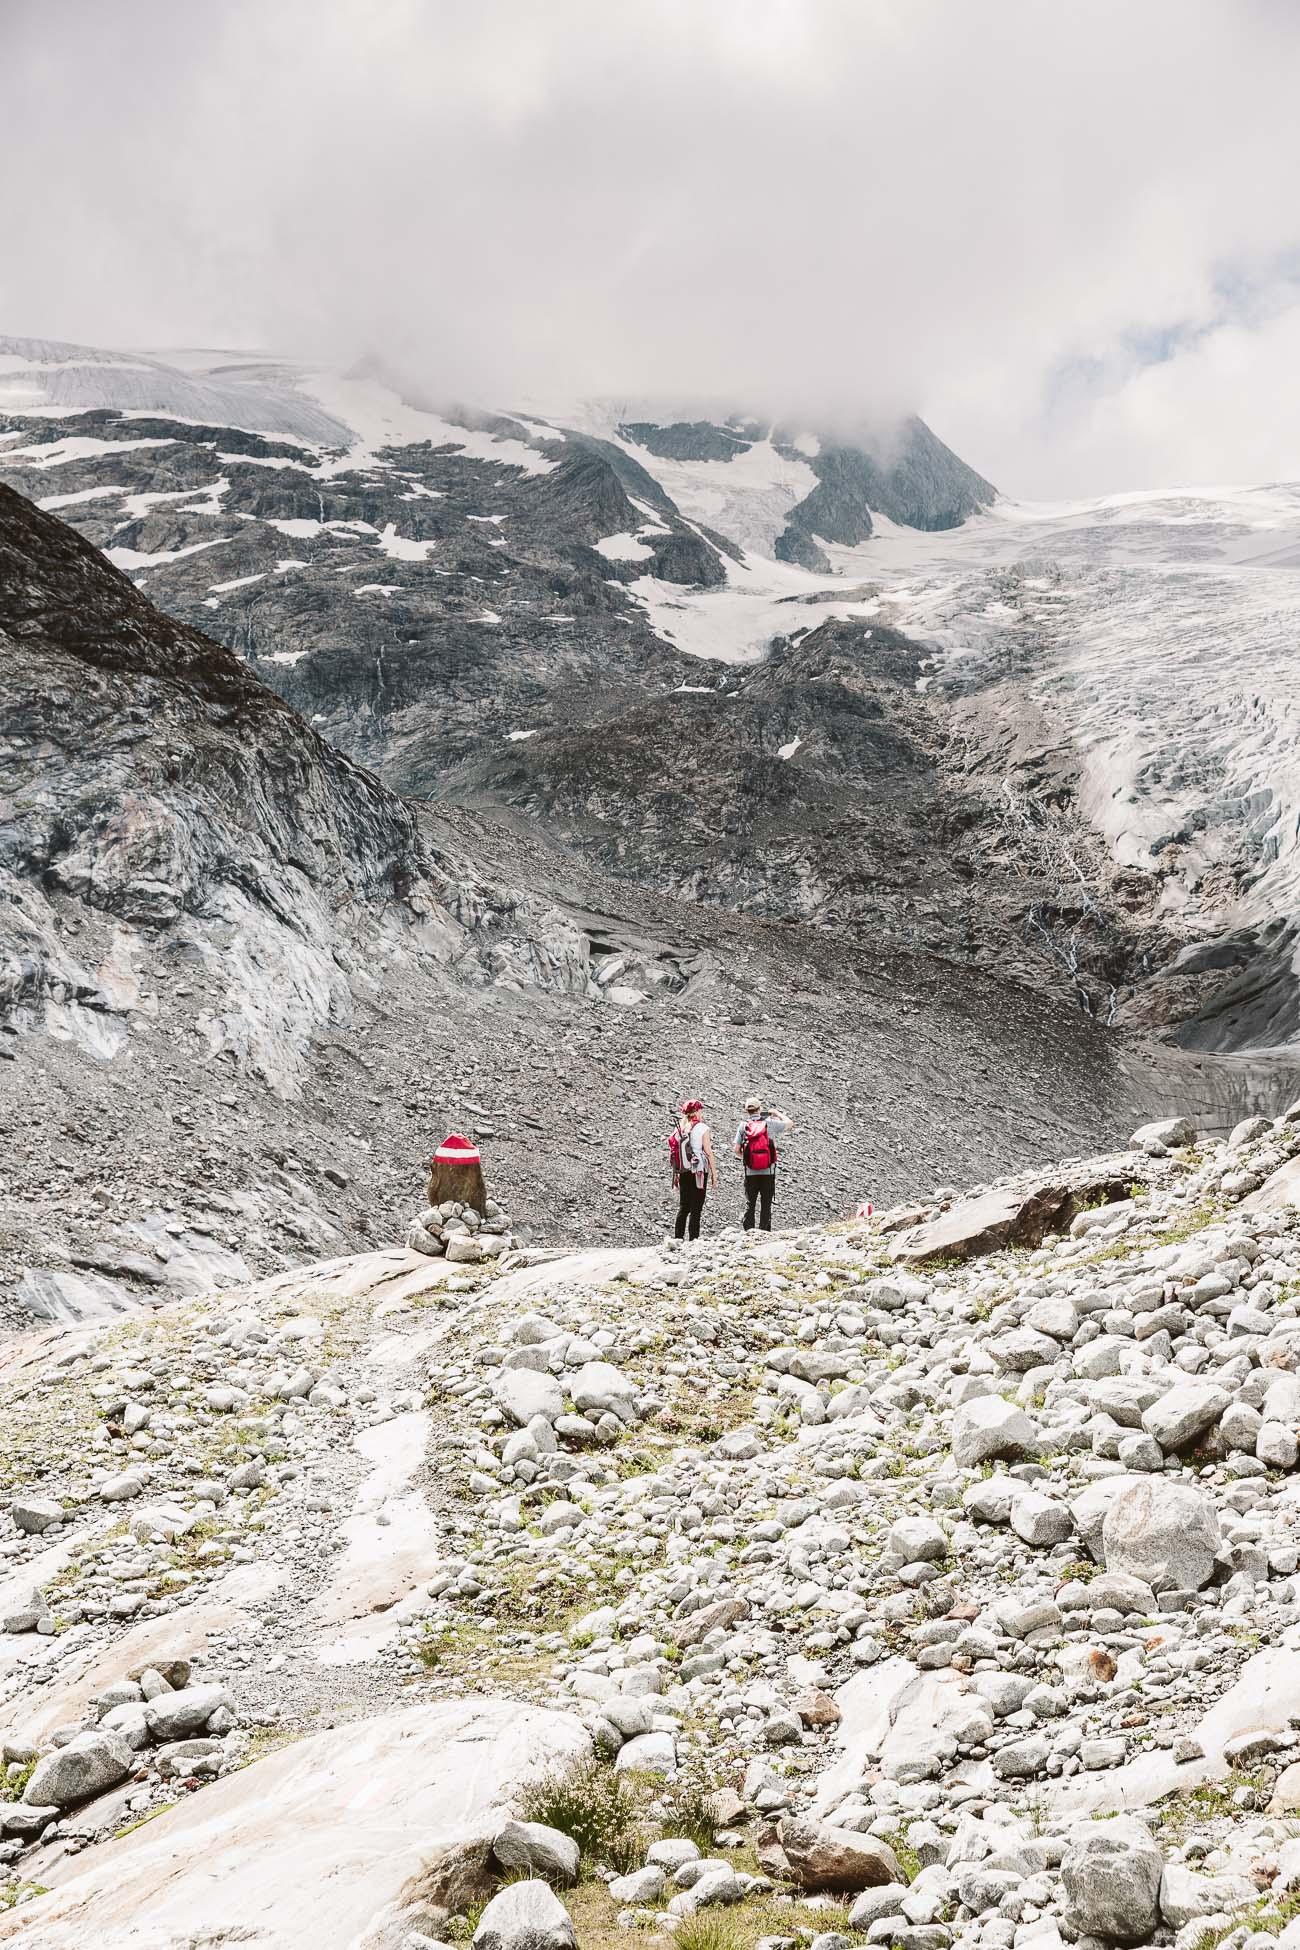 Austria's National Park Hohe Tauern Schlatenkees